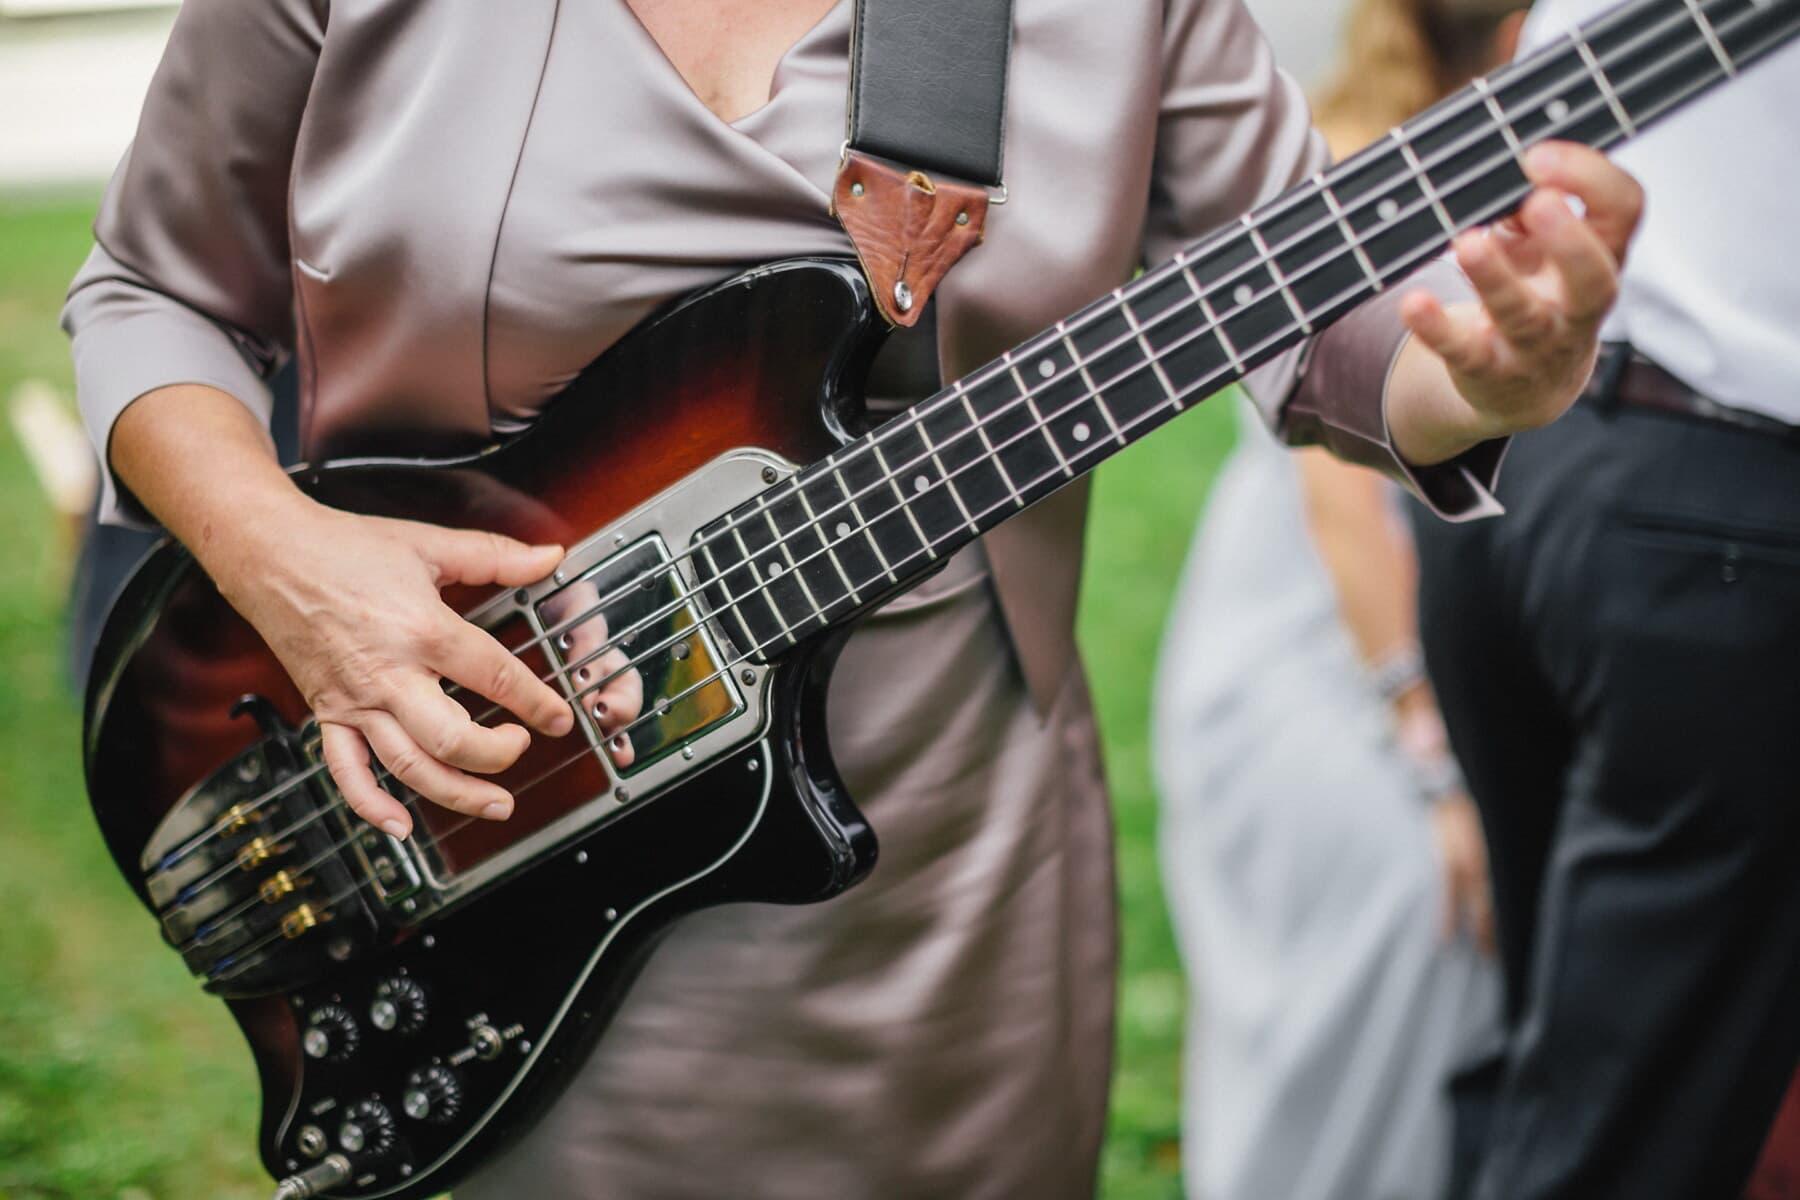 Elektronische, Gitarre, Gitarrist, Frau, Performer, musikalischen, Musik, Instrument, Musiker, Band